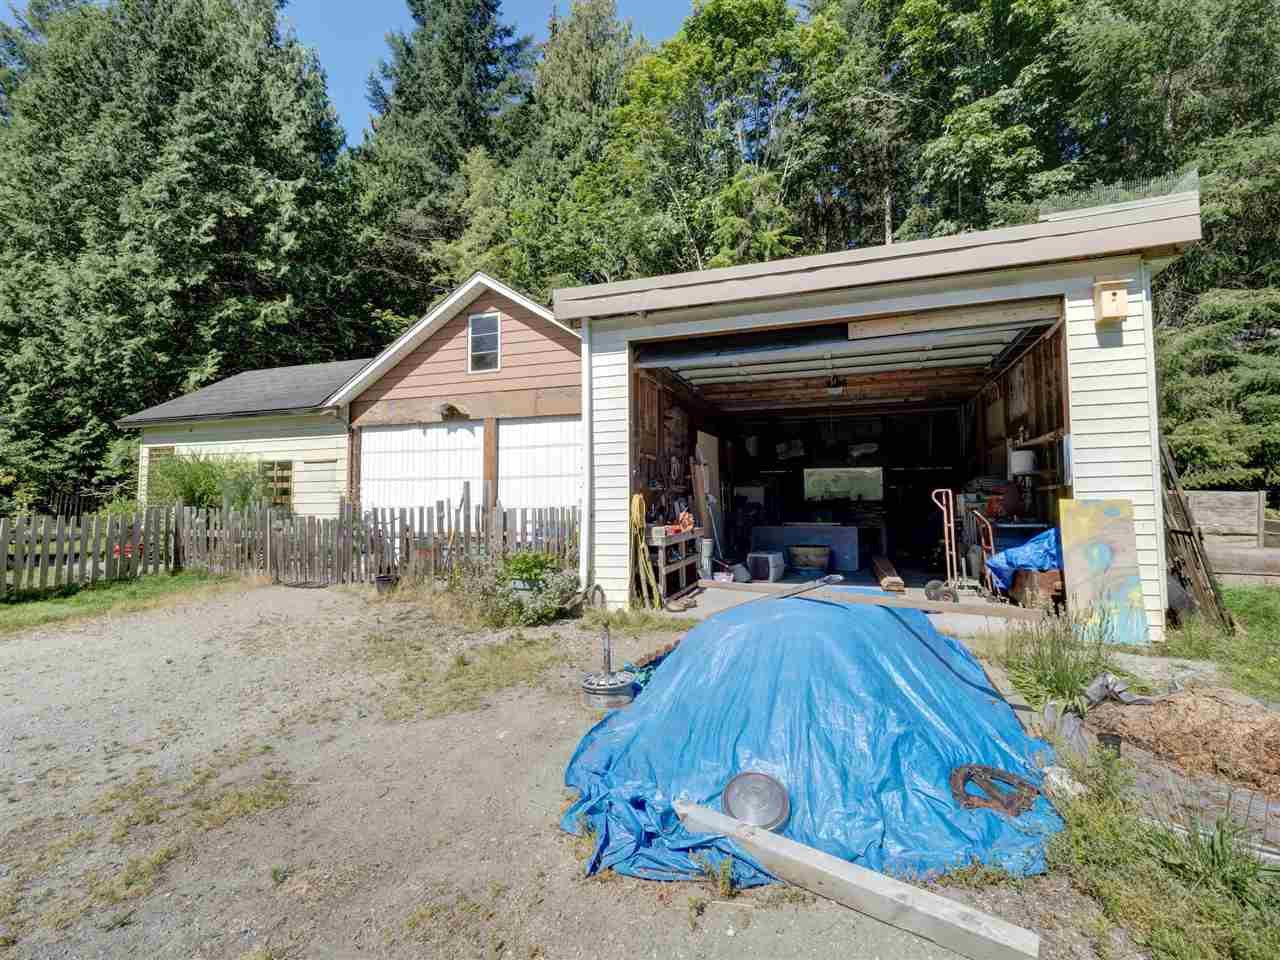 Photo 7: Photos: 5761 MCLAUGHAN Road in Sechelt: Sechelt District House for sale (Sunshine Coast)  : MLS®# R2479077